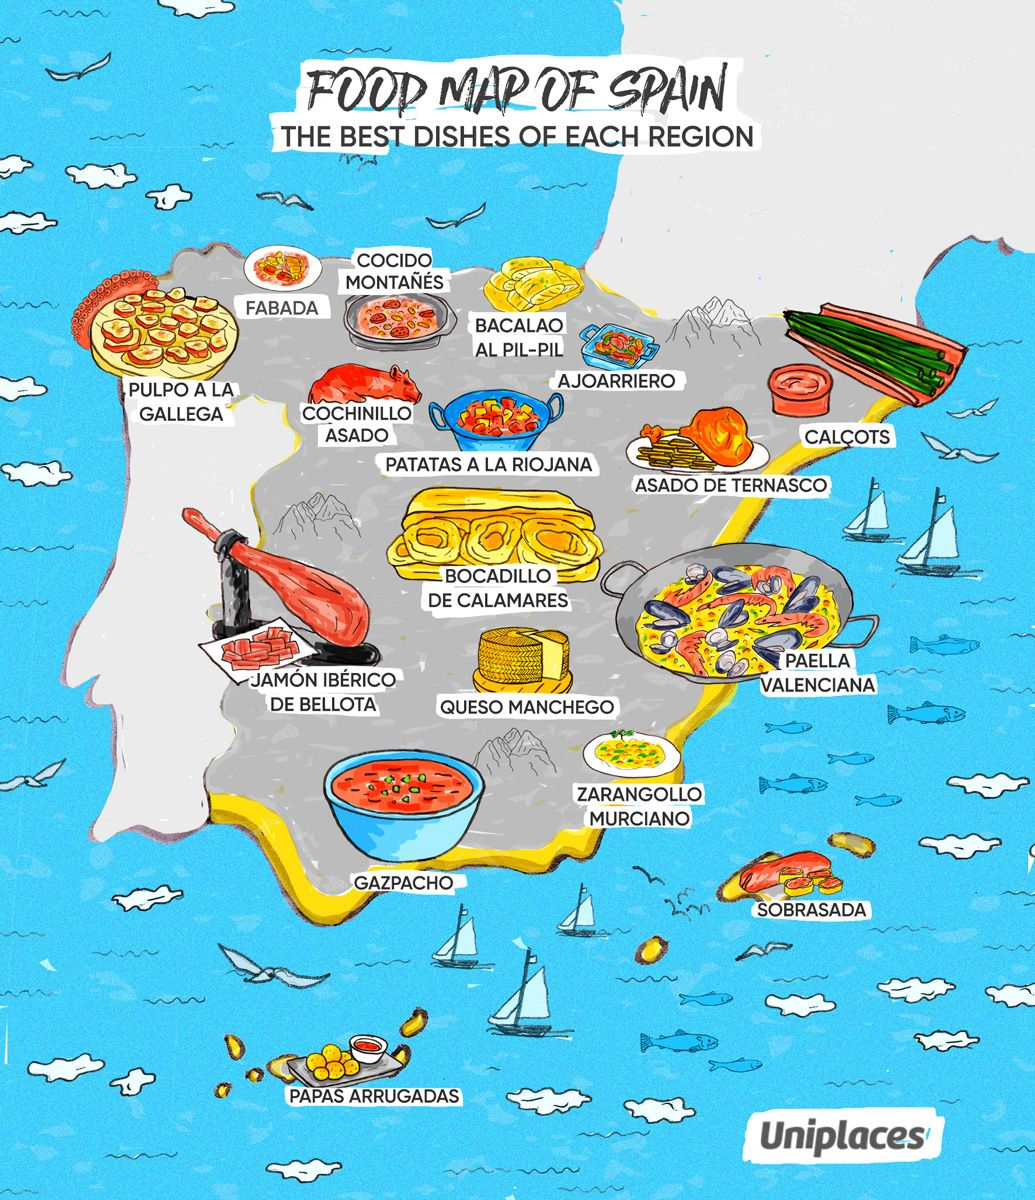 Regional Map Of Spain.Regional Food Map Infographic Of Spain Travel Map Of Spain